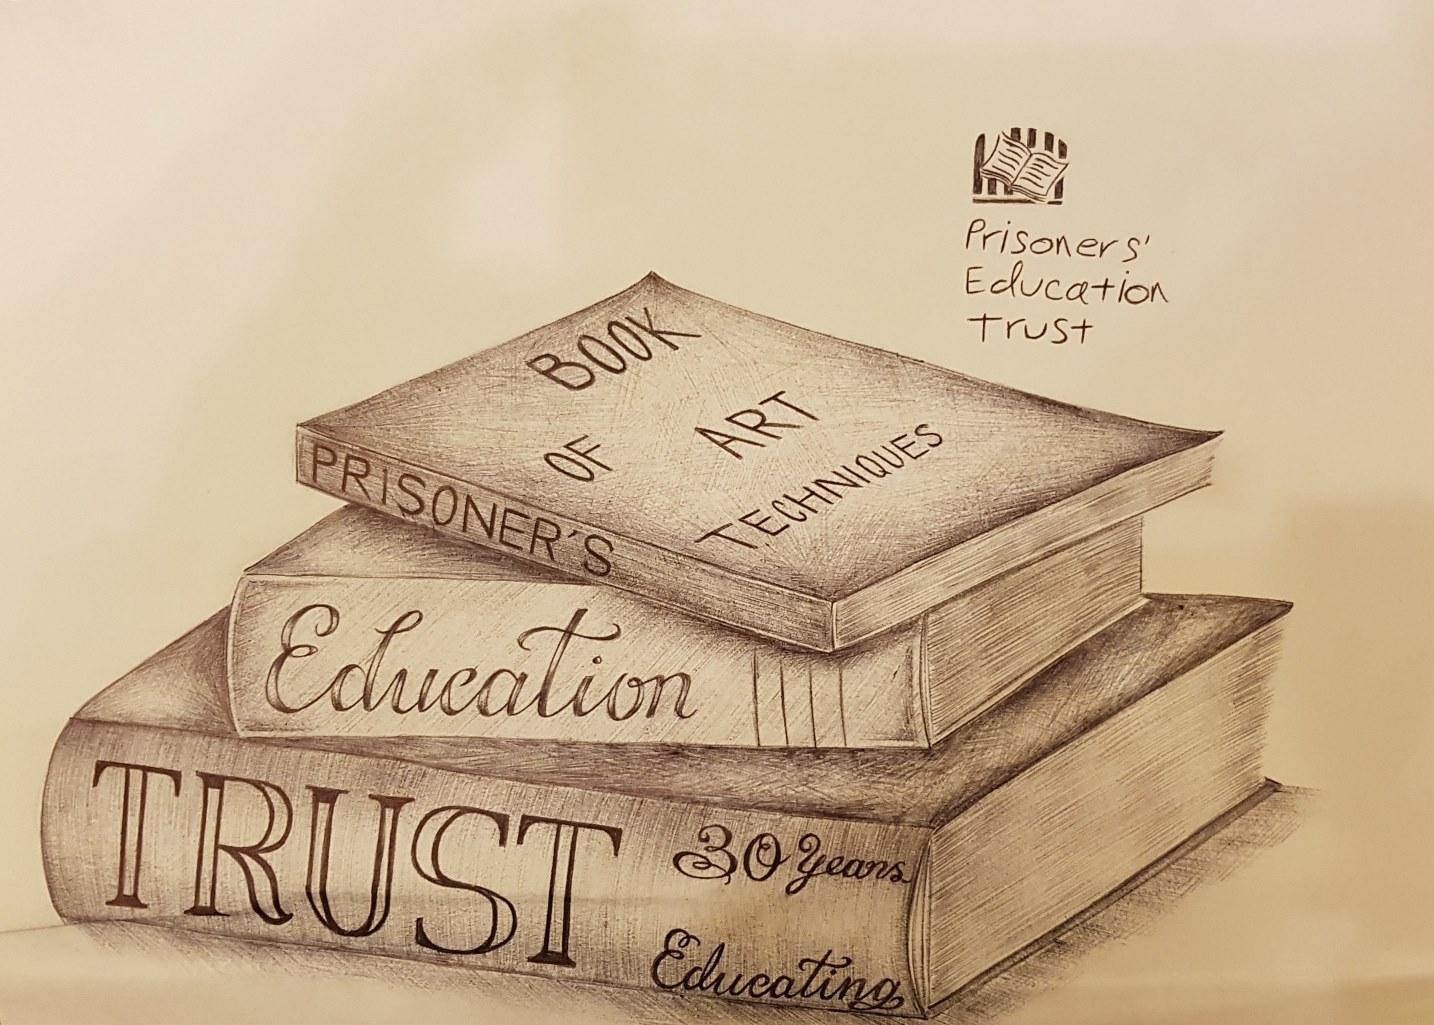 Prisoners' Education Trust art